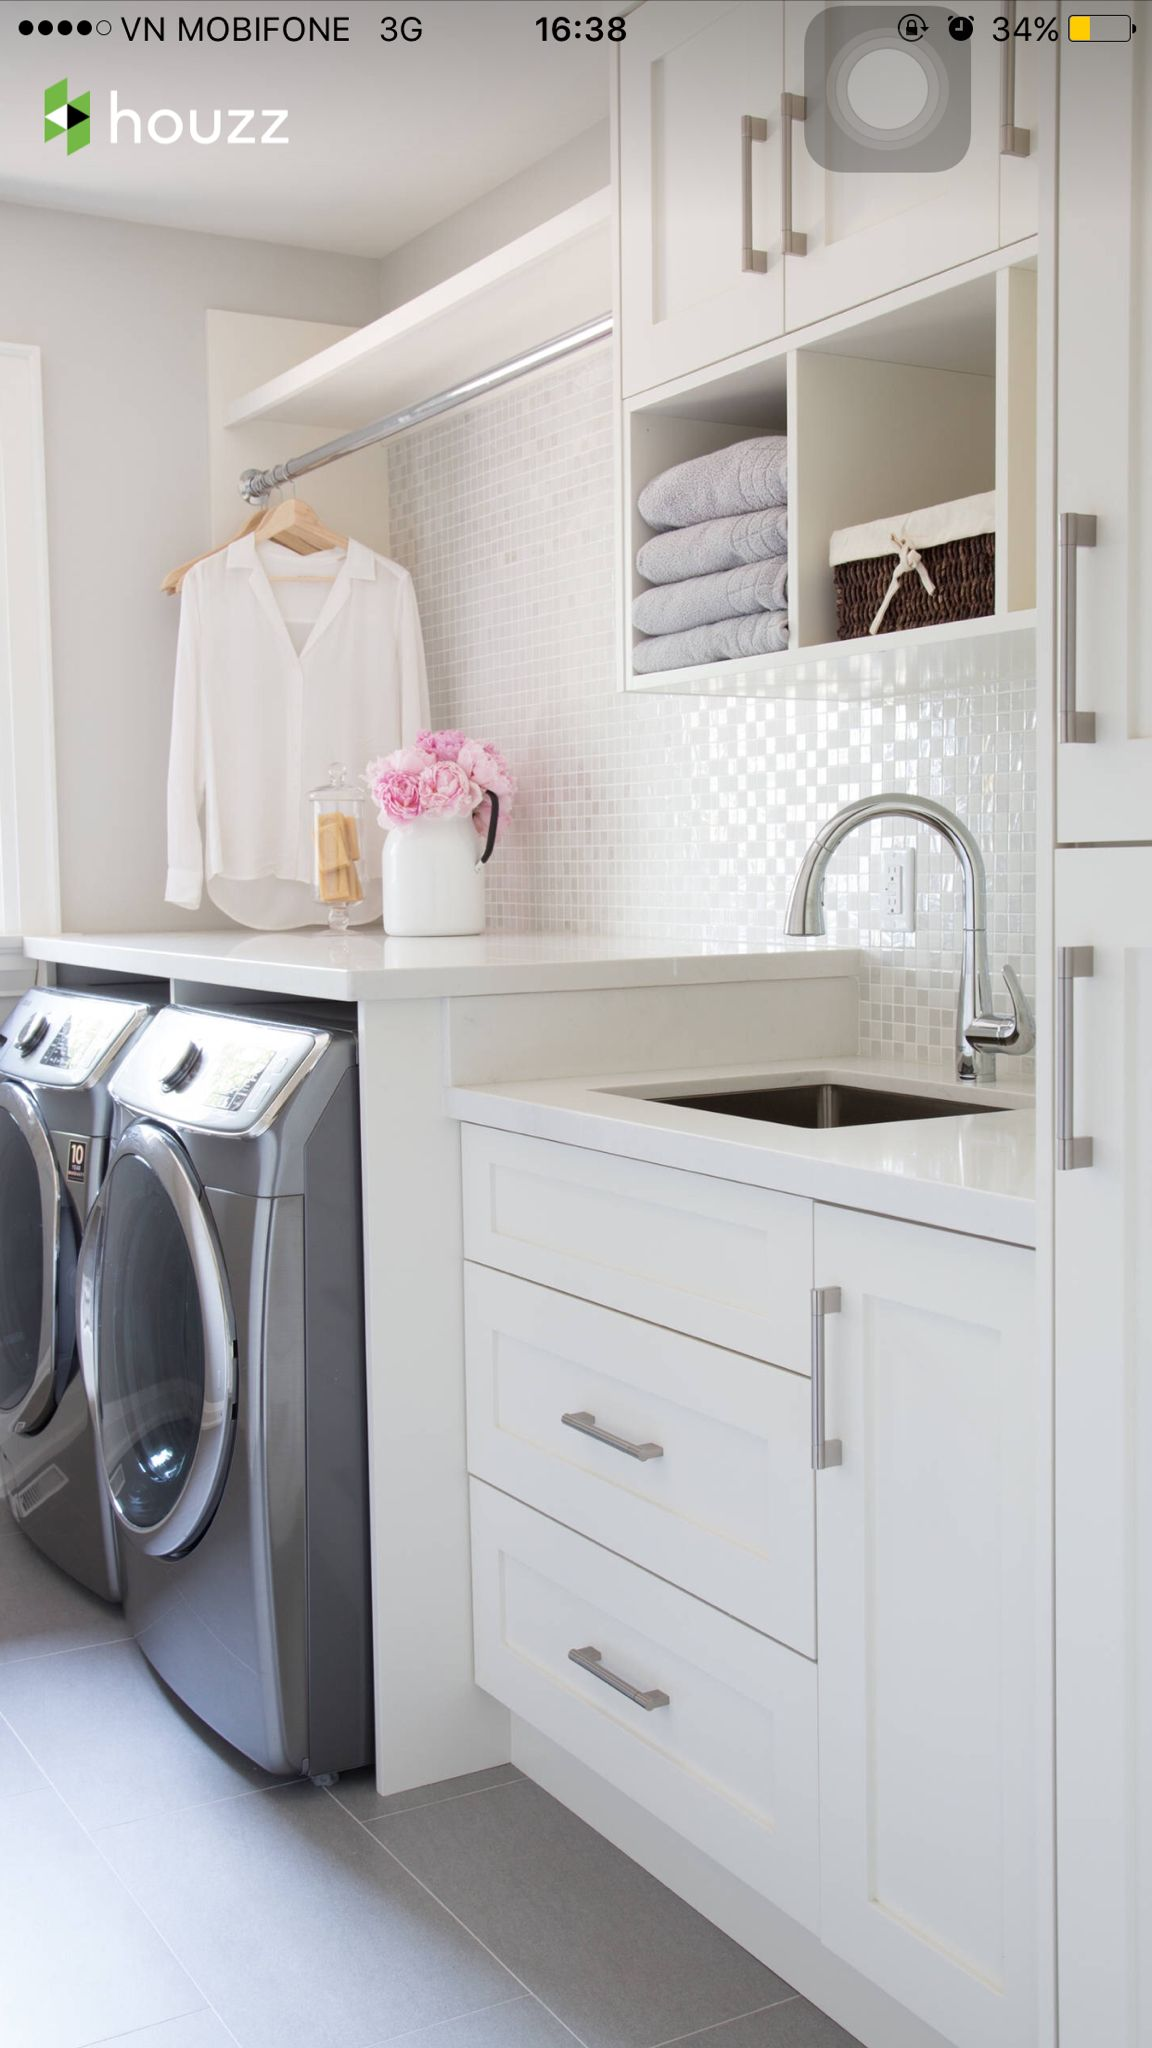 Laundry Hsh Neoclassical Pinterest Lavander A Lavaderos Y Lavar ~ Lavar Cortinas Blancas Muy Sucias